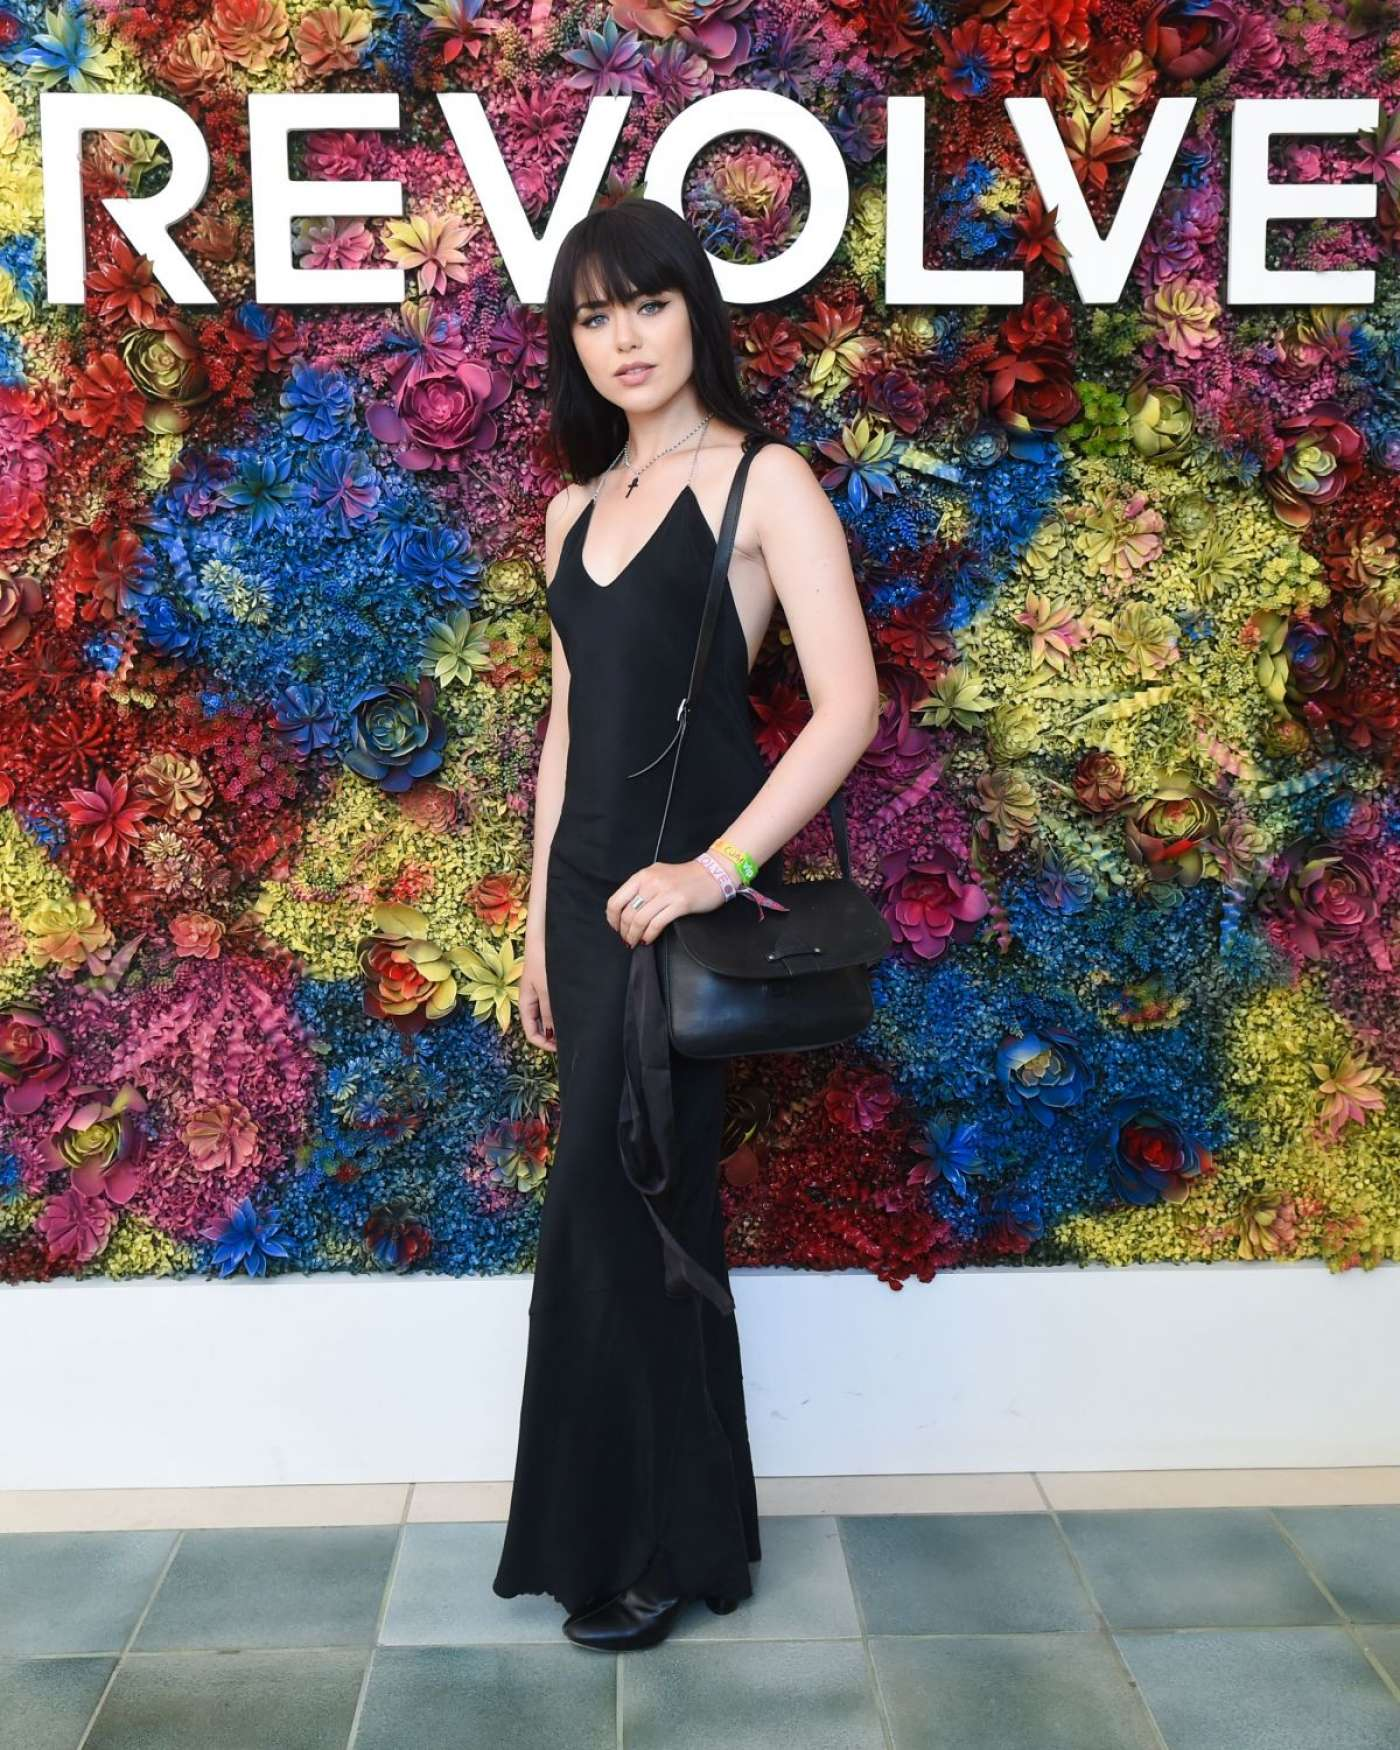 Kristina bazan revolve festival day 2 at coachella in palm springs nudes (63 photo), Ass Celebrity photos